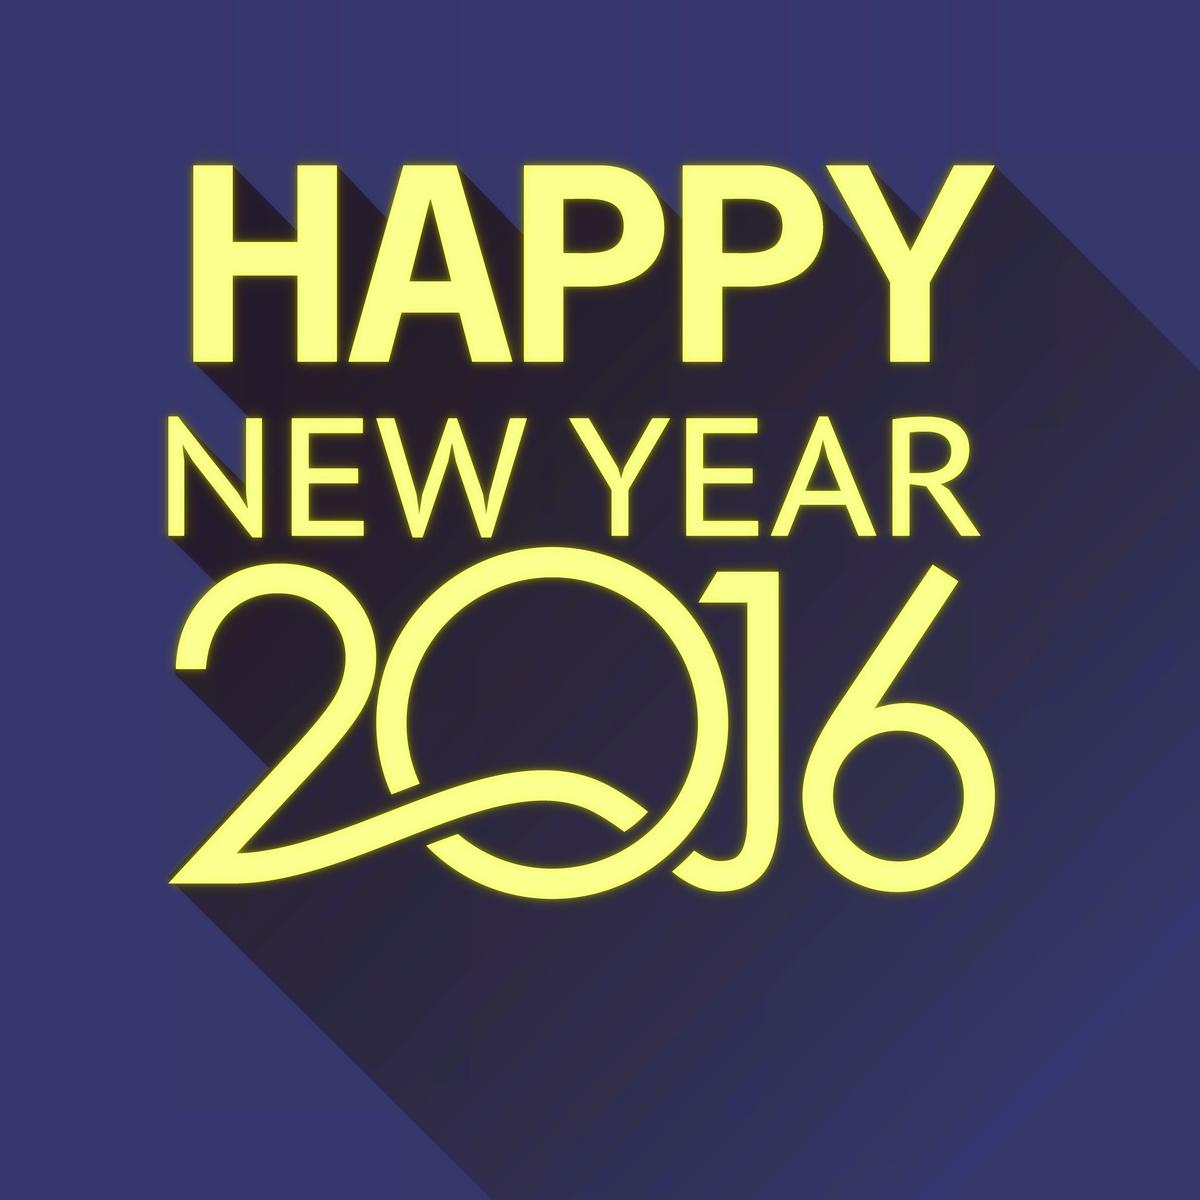 Gambar Ucapan Tahun Baru 2016 Terbaik Dan Terbaru Gudang Gambar